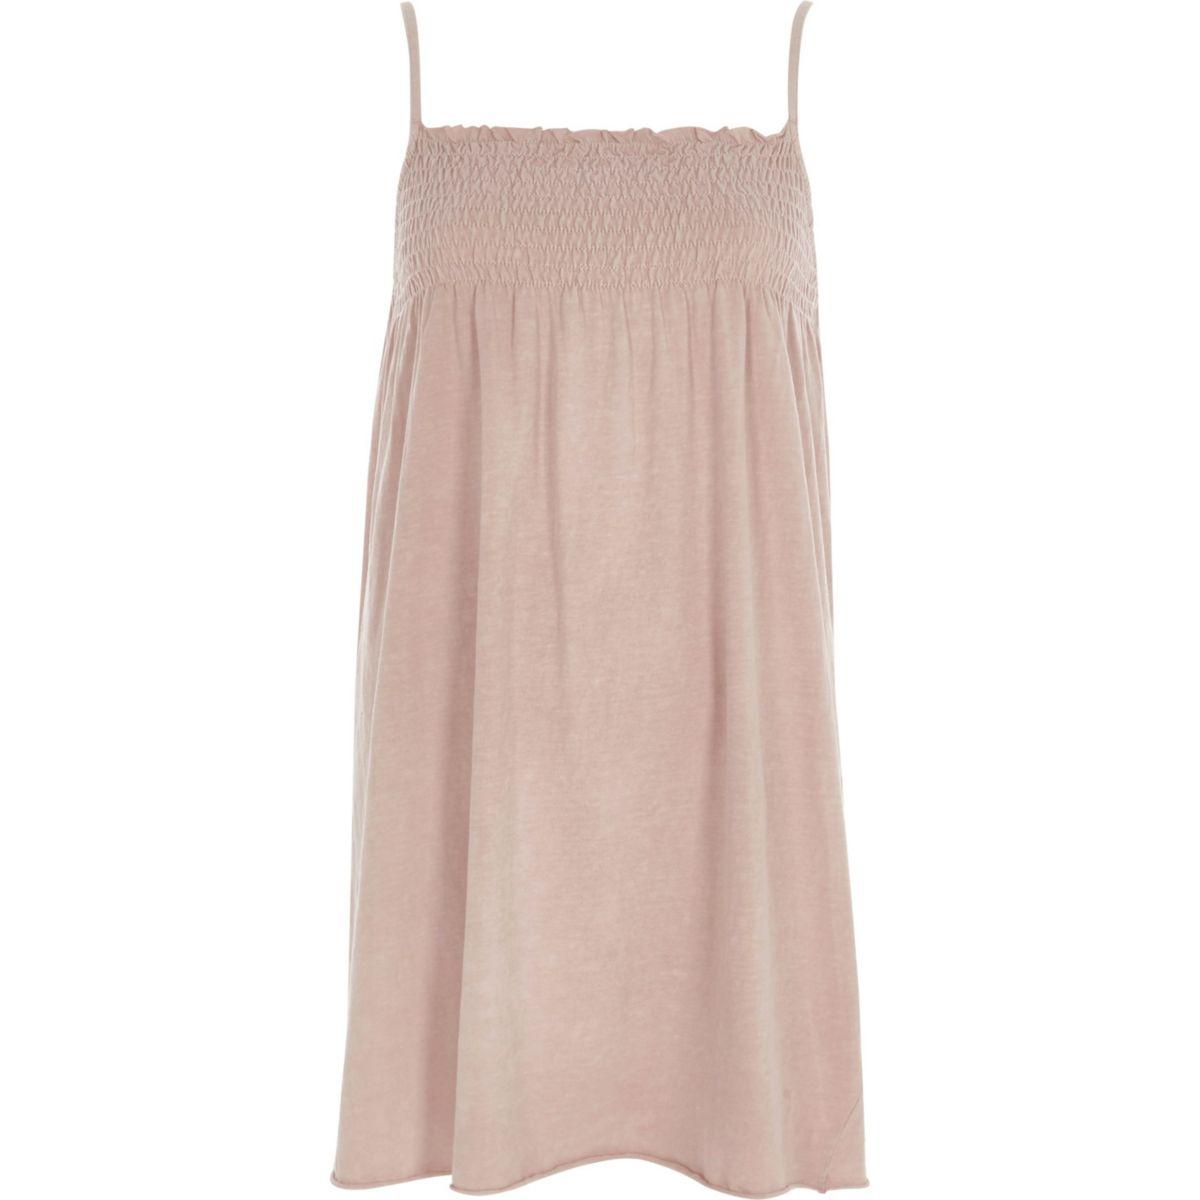 Light pink shirred jersey cami dress